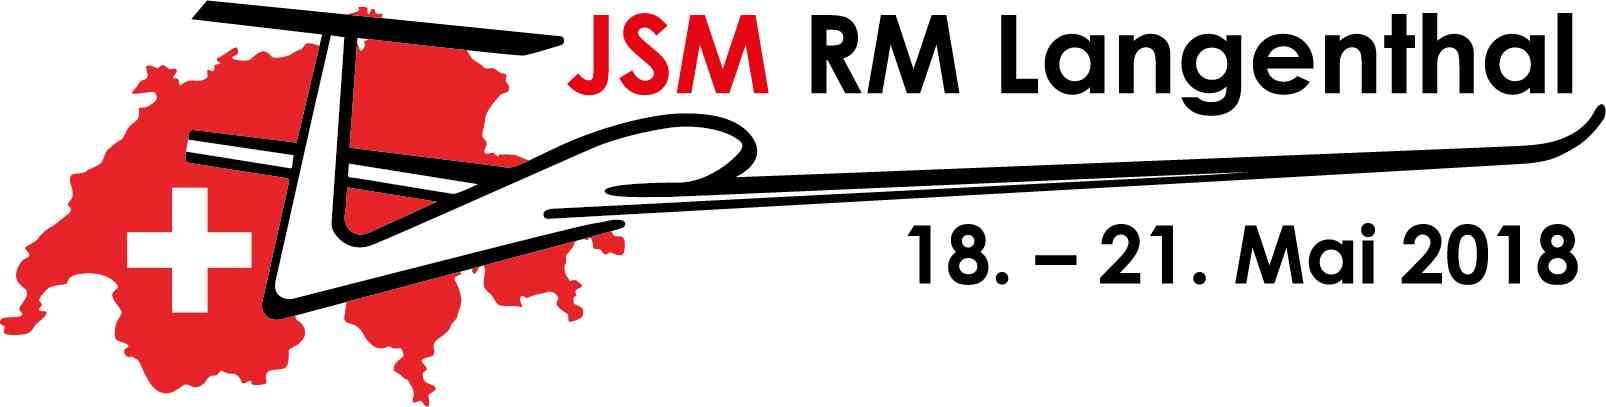 JSM/RM